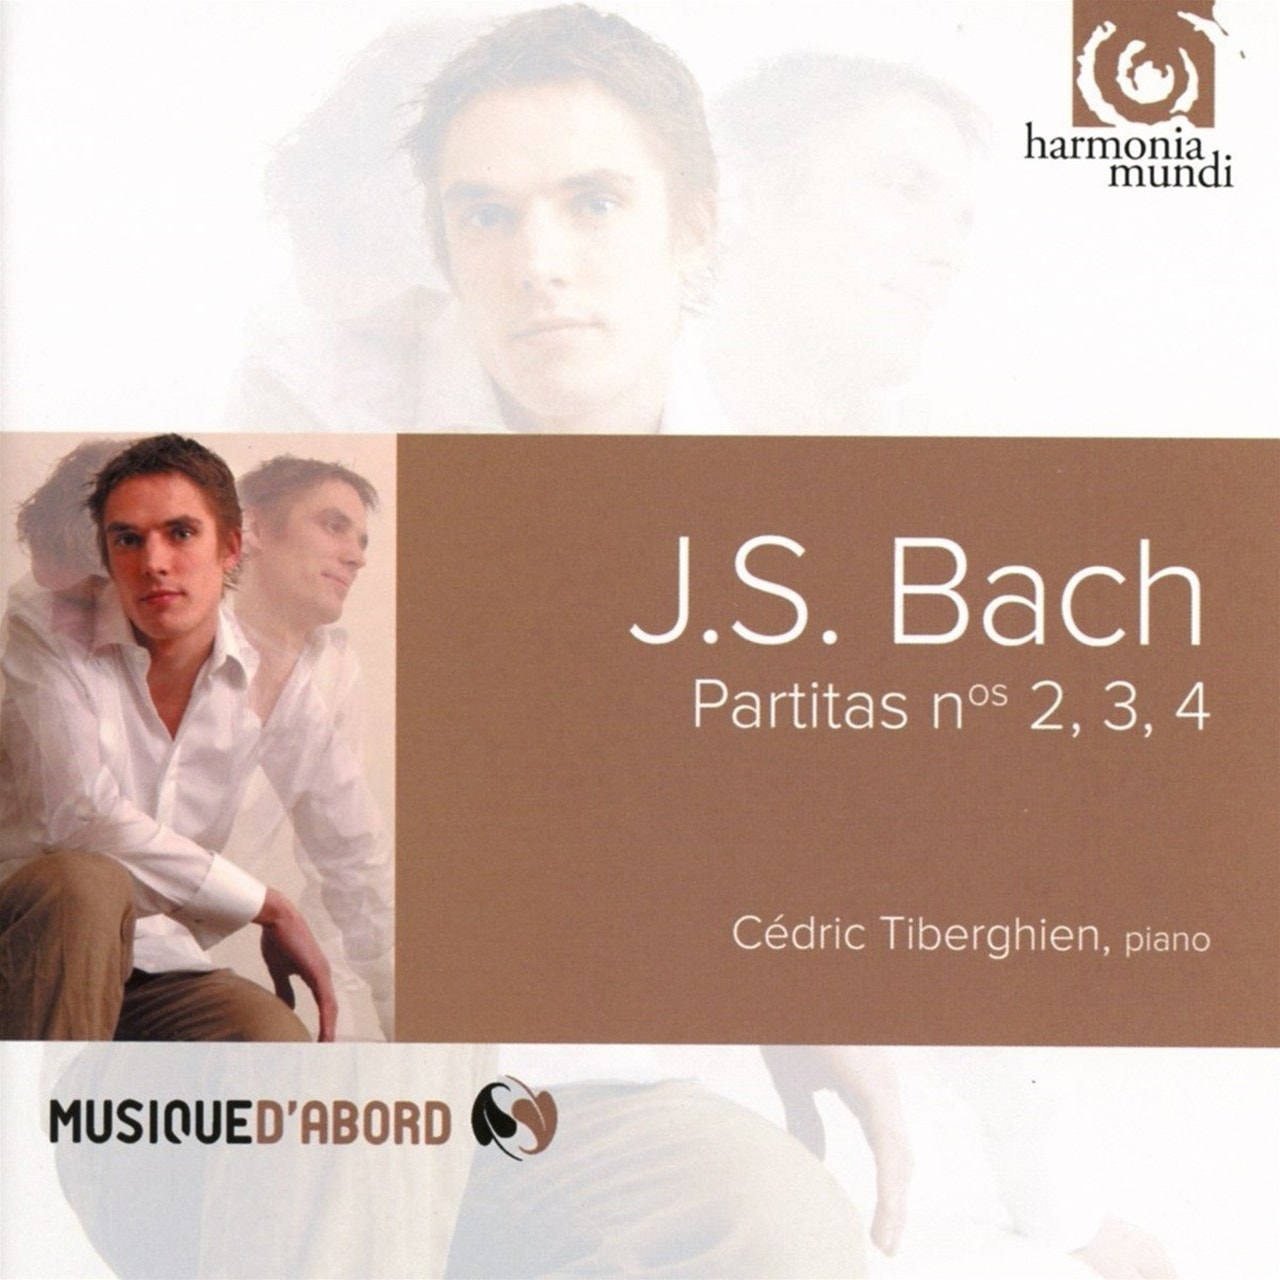 J.S. Bach: Partitas Nos. 2, 3, 4 - 1